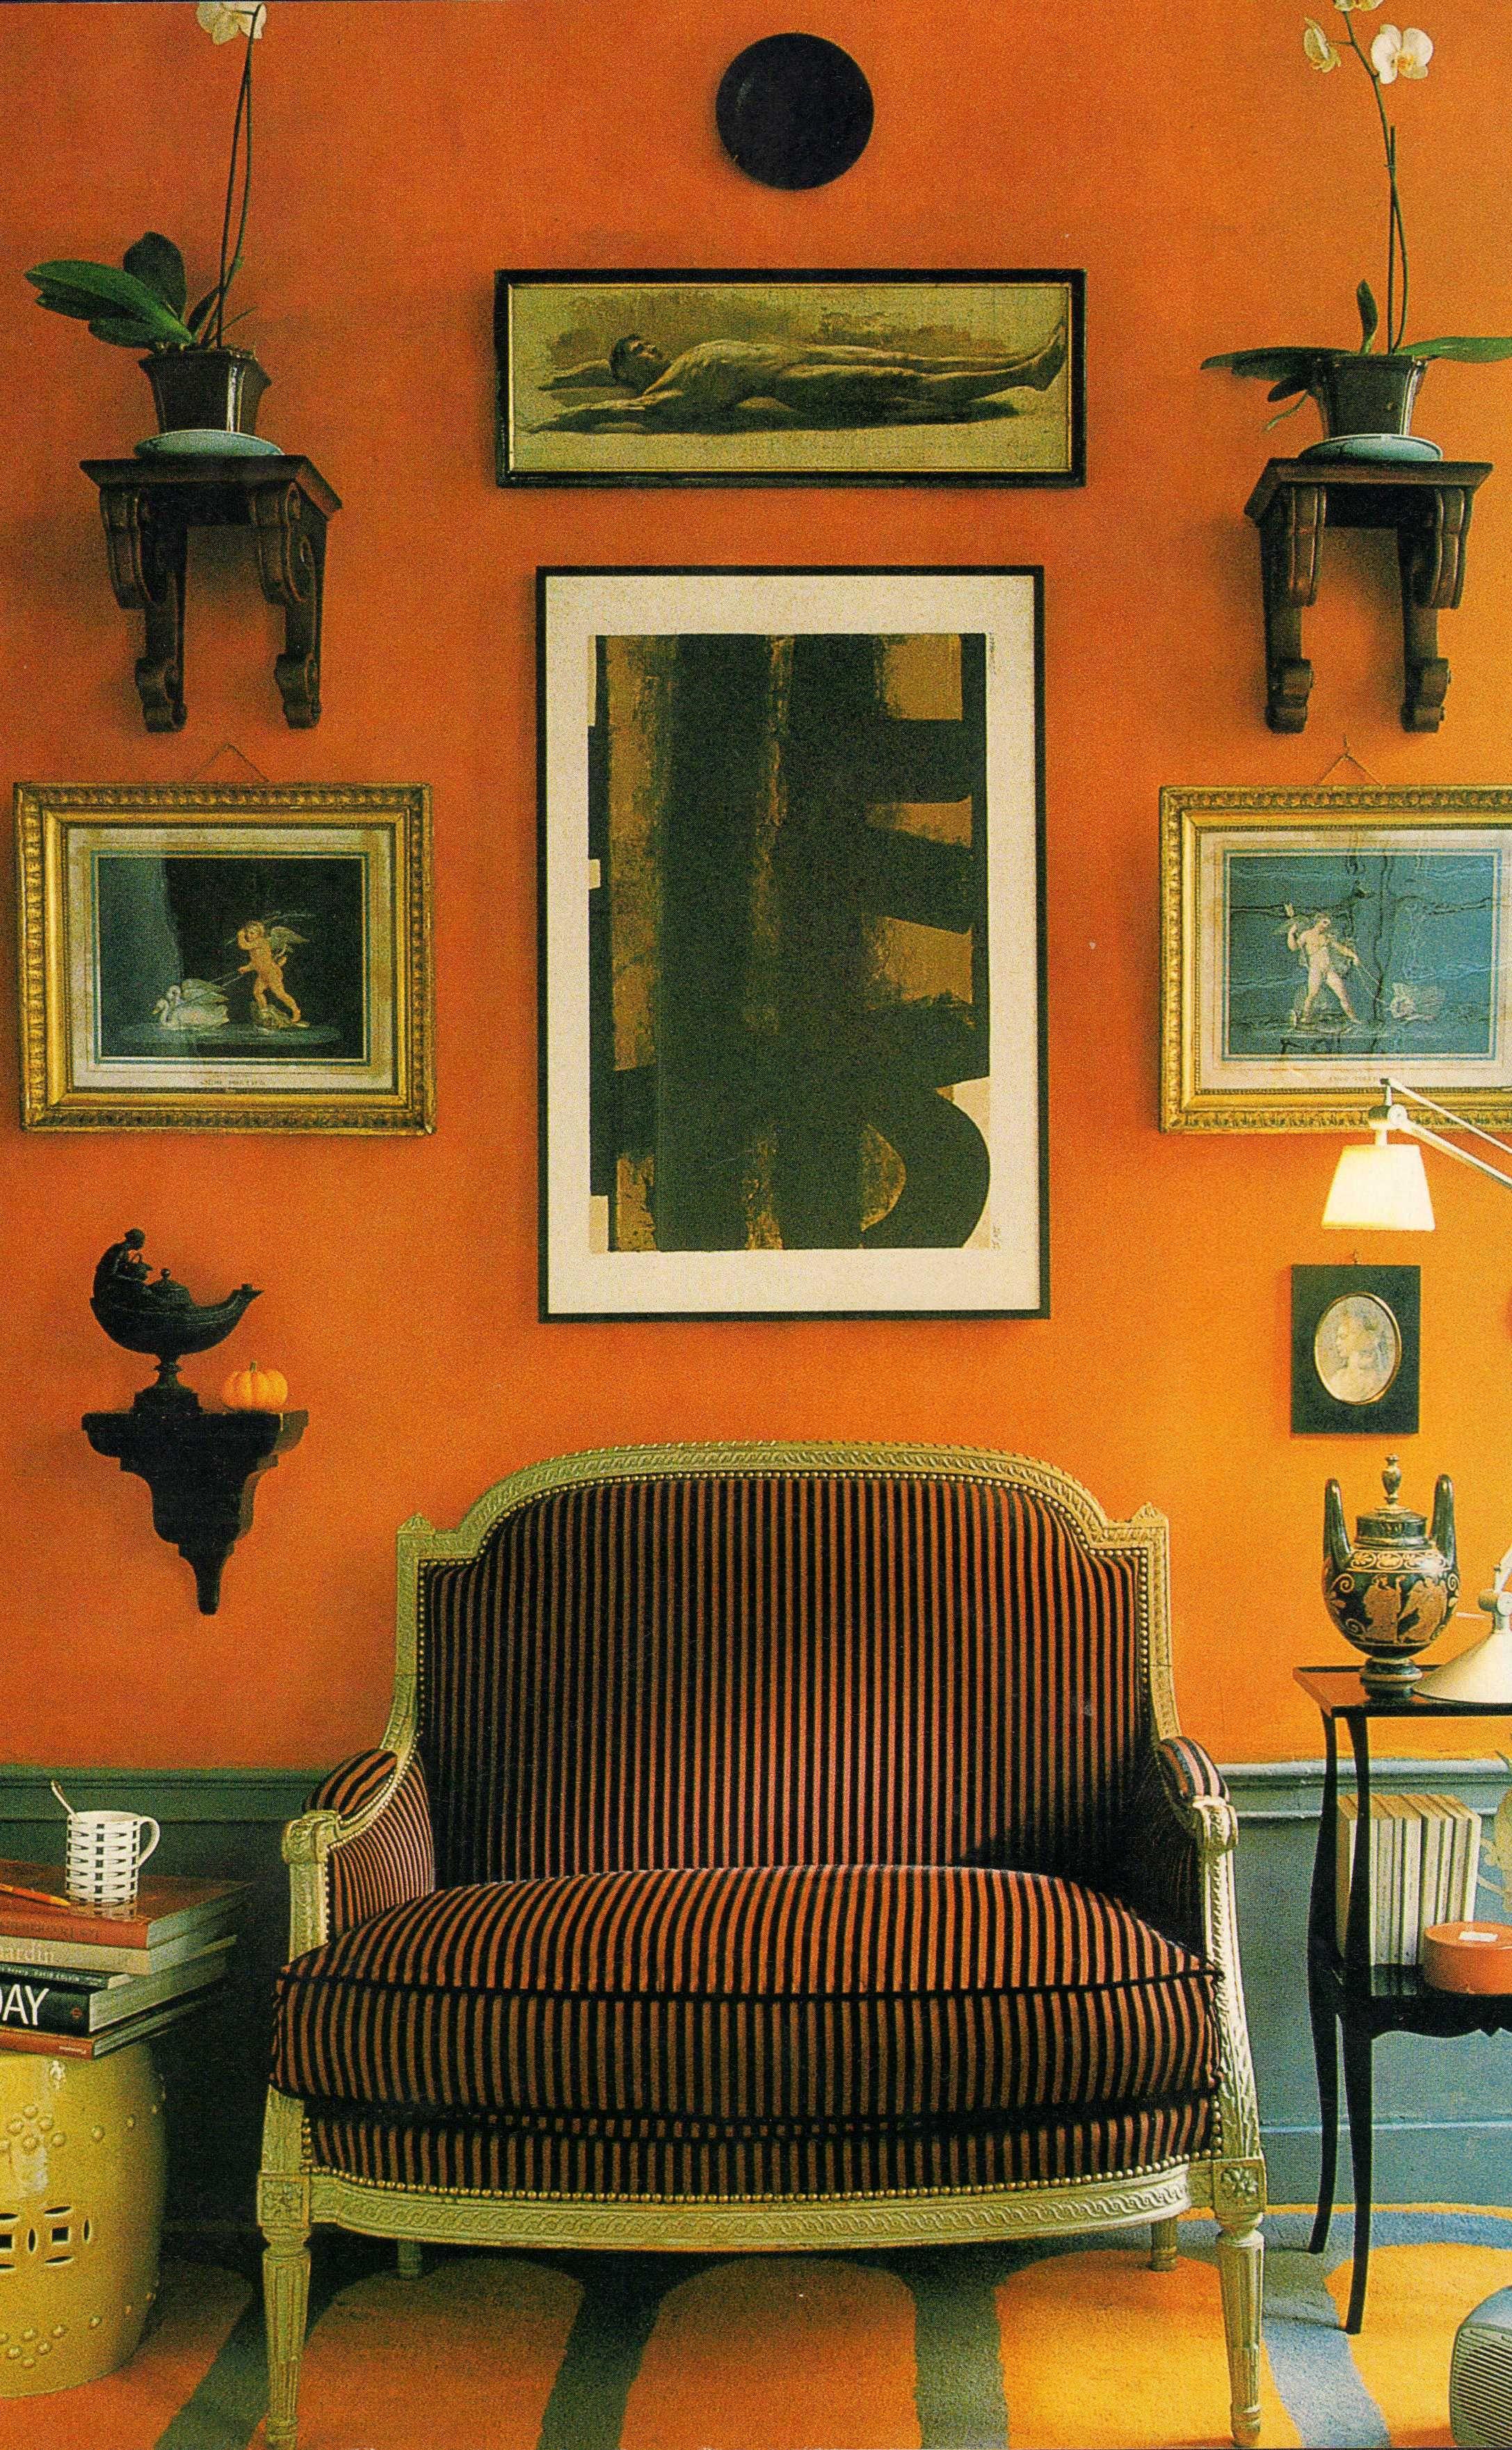 appartment in paris interior design by bruno de caumont interiors bruno de caumont. Black Bedroom Furniture Sets. Home Design Ideas